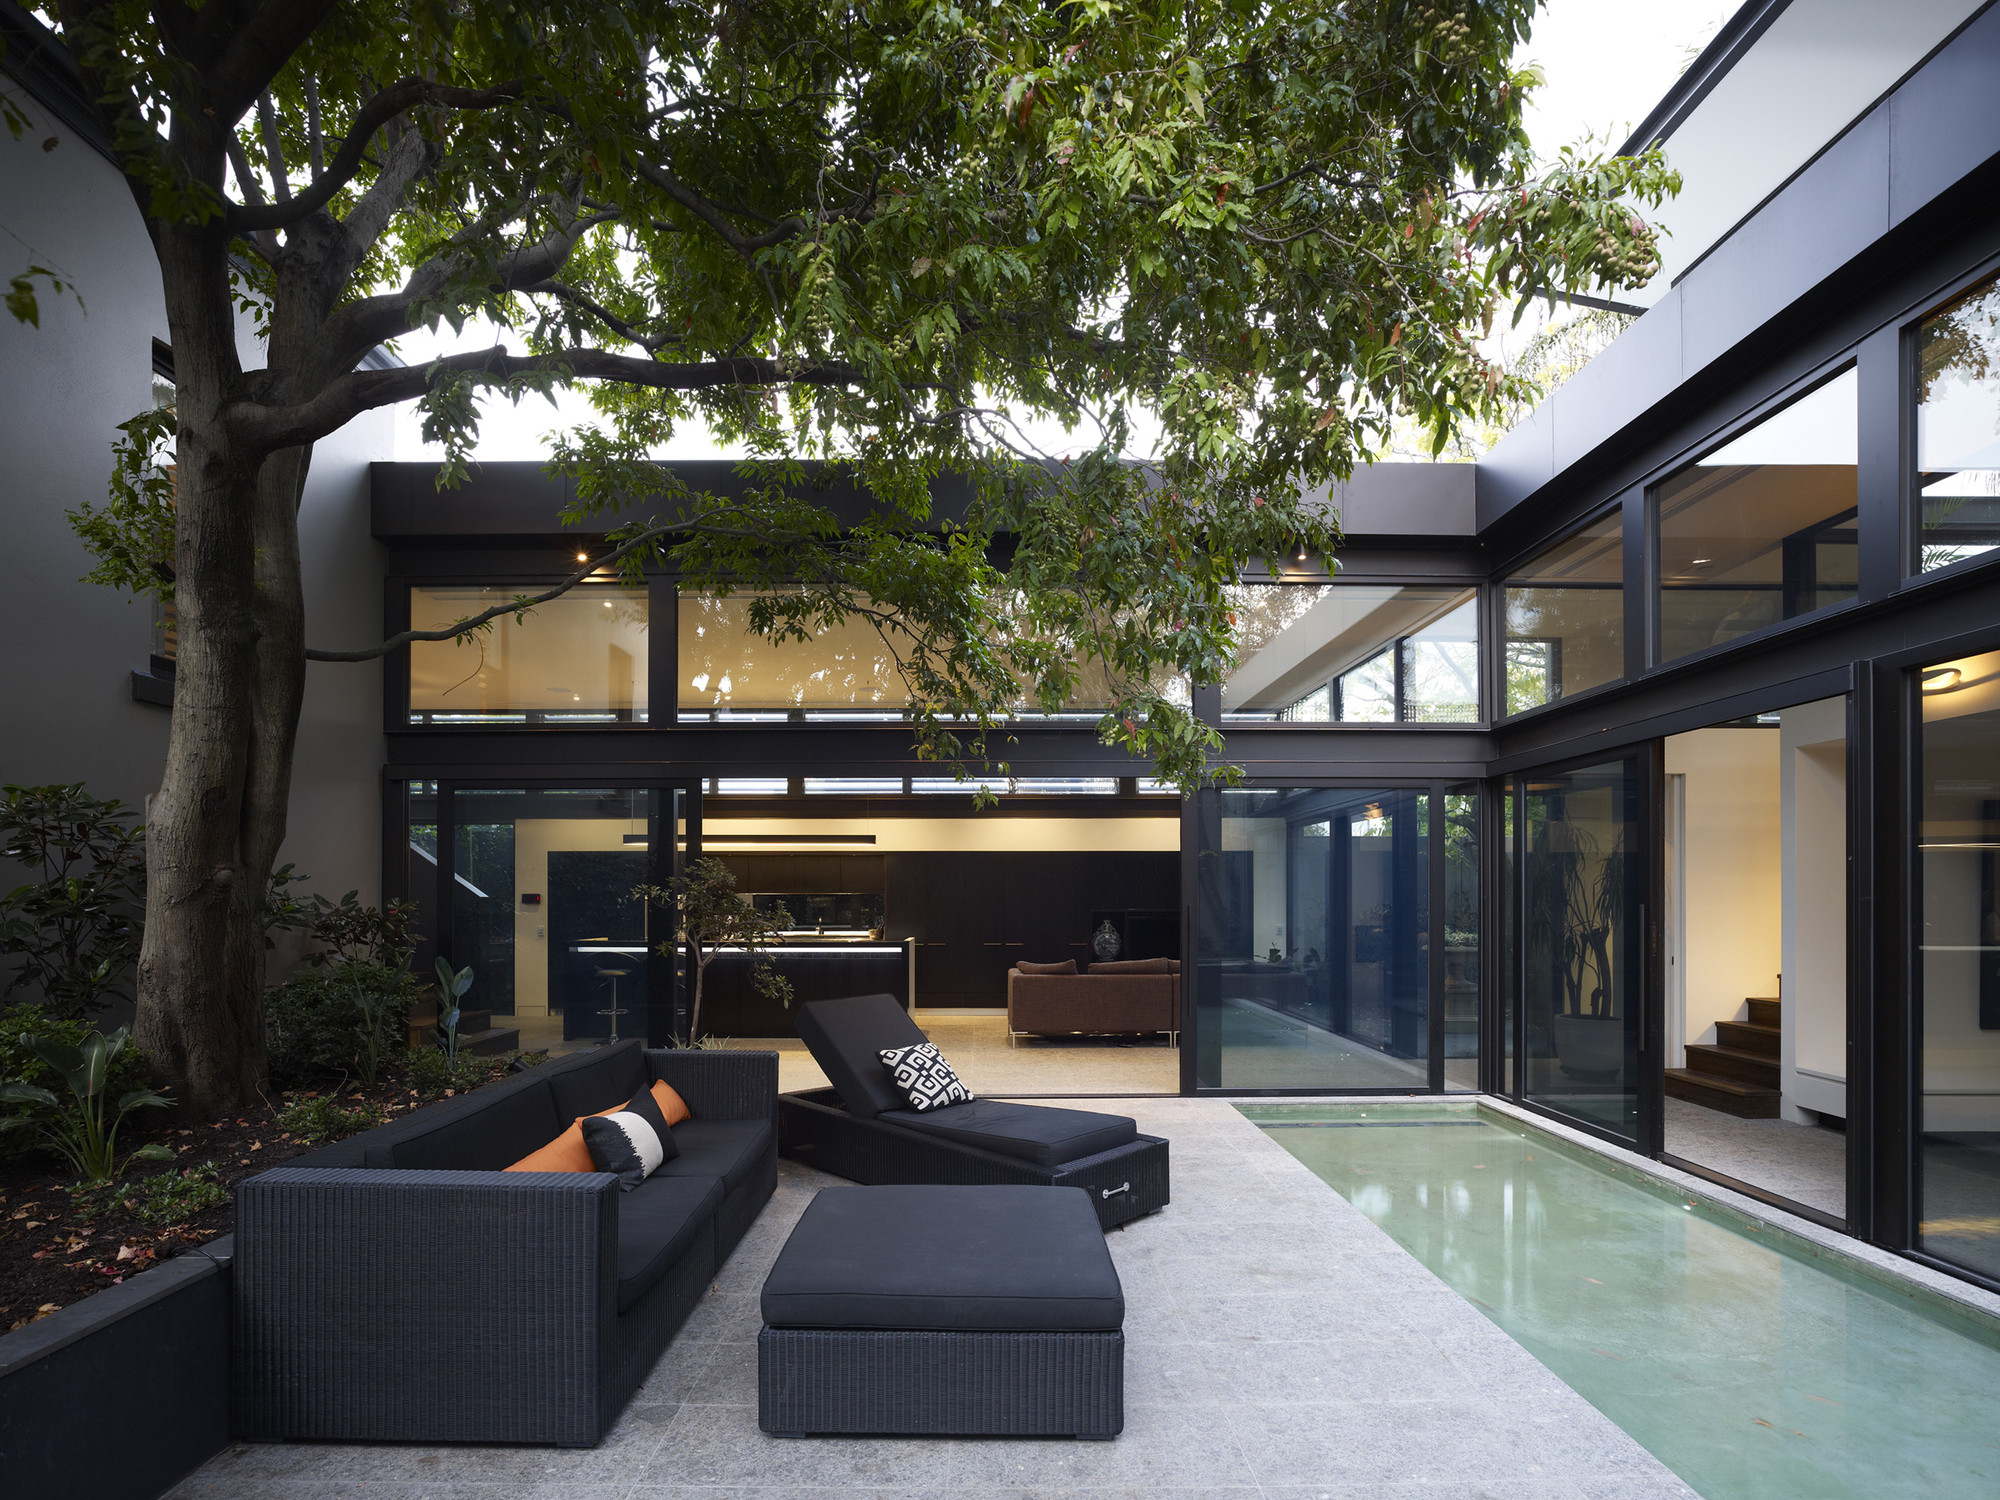 Harcourt / Steve Domoney Architecture